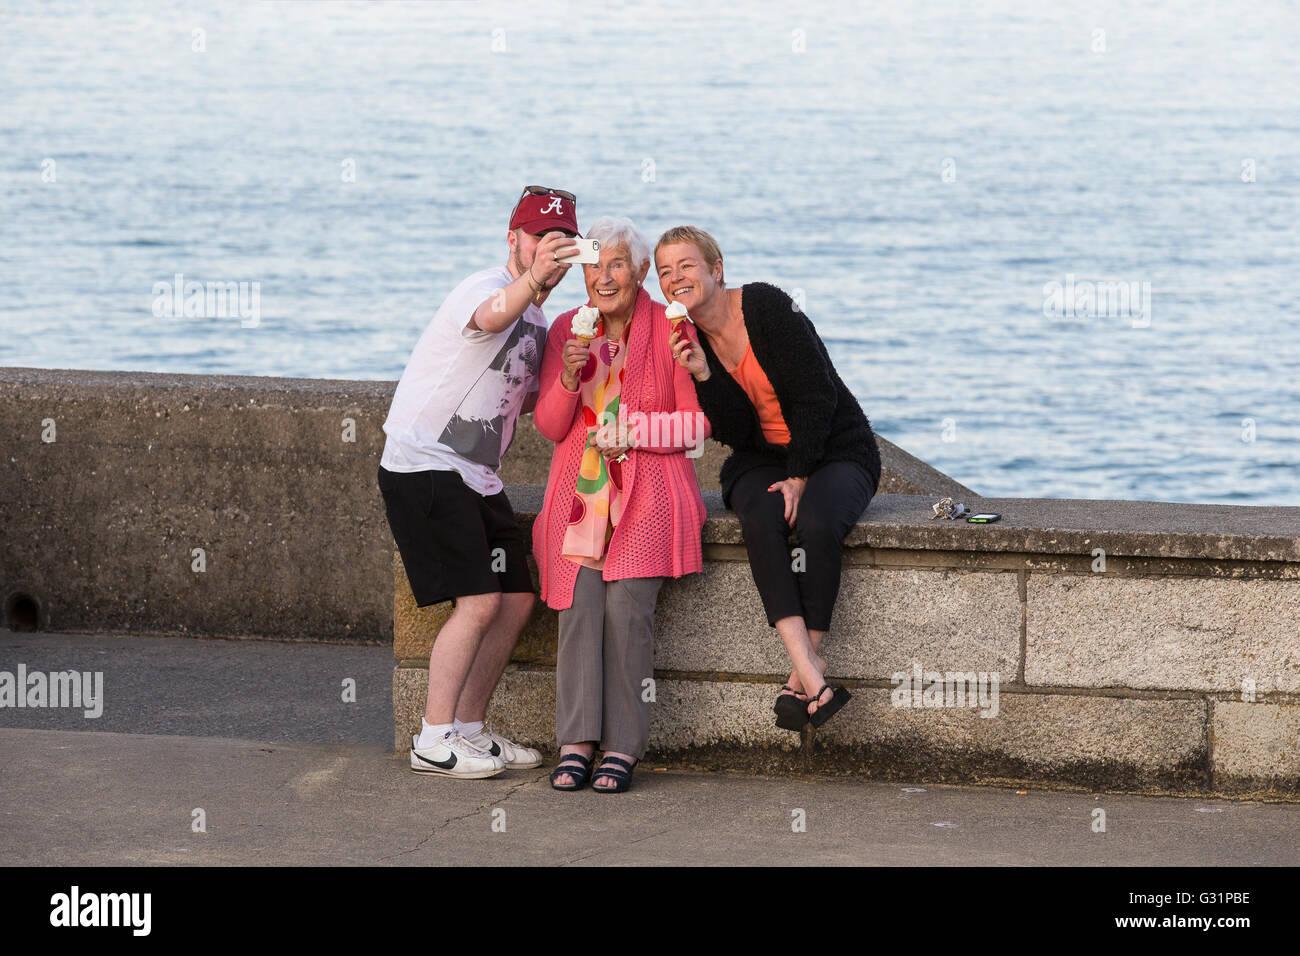 3 grupo de tres personas selfie foto hombre hombres mujer uk Imagen De Stock